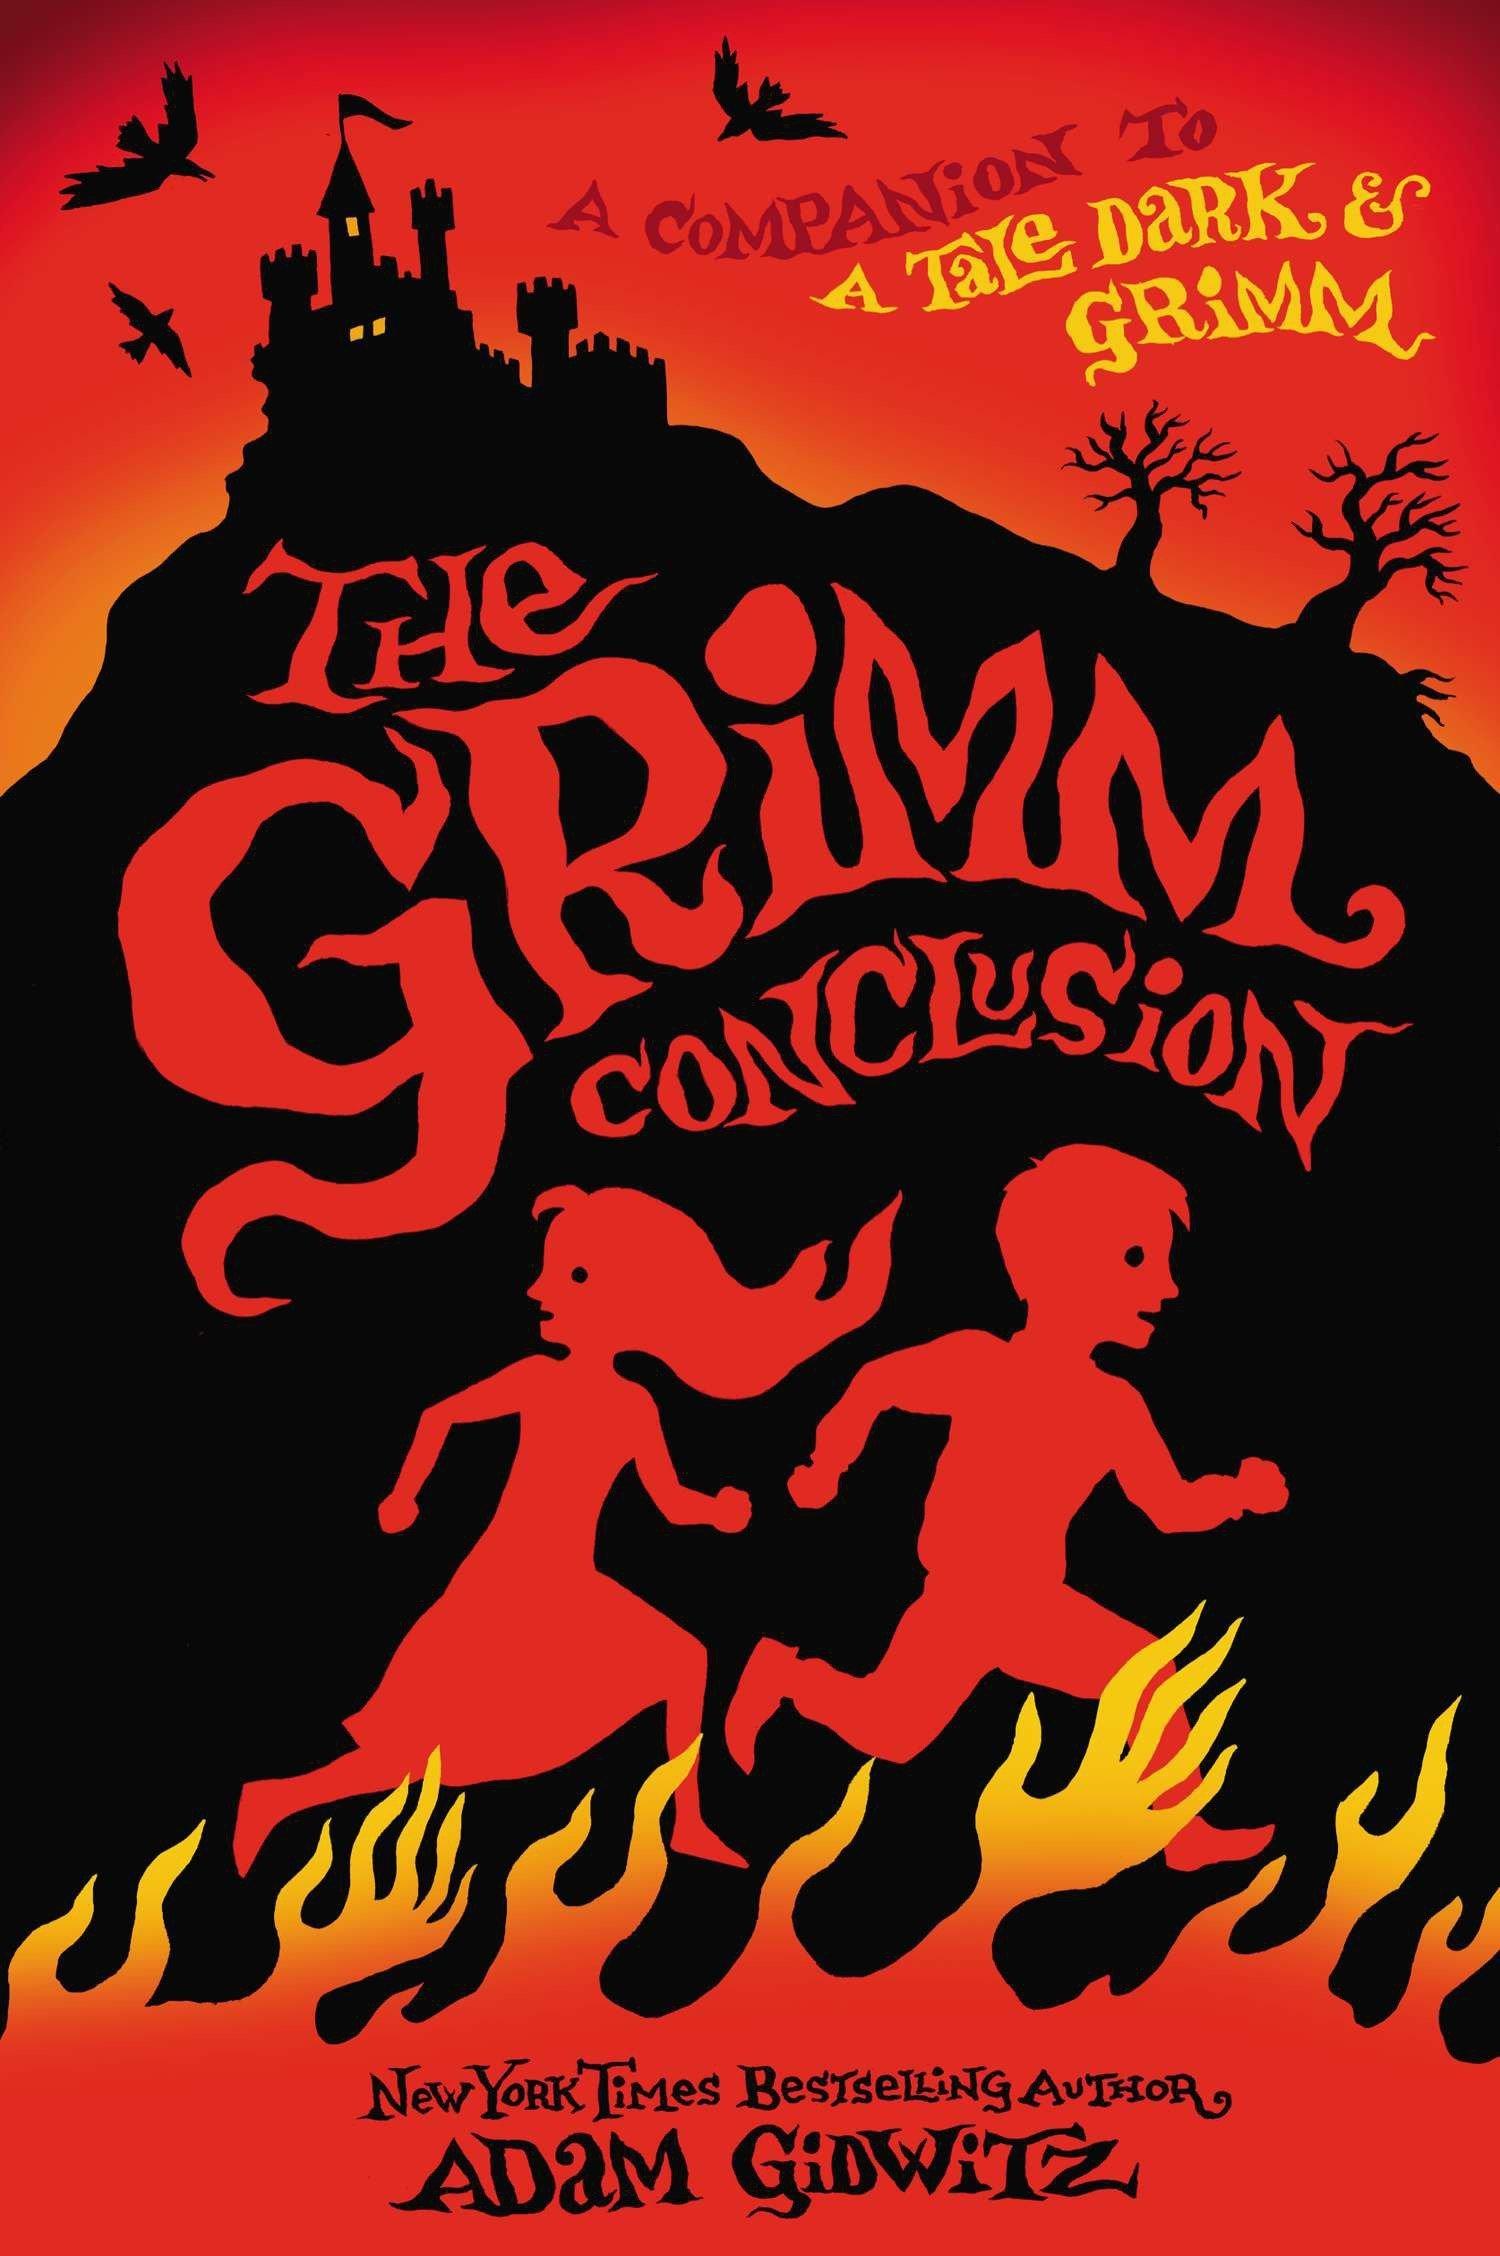 gidwitz-grimm-conclusion.jpg